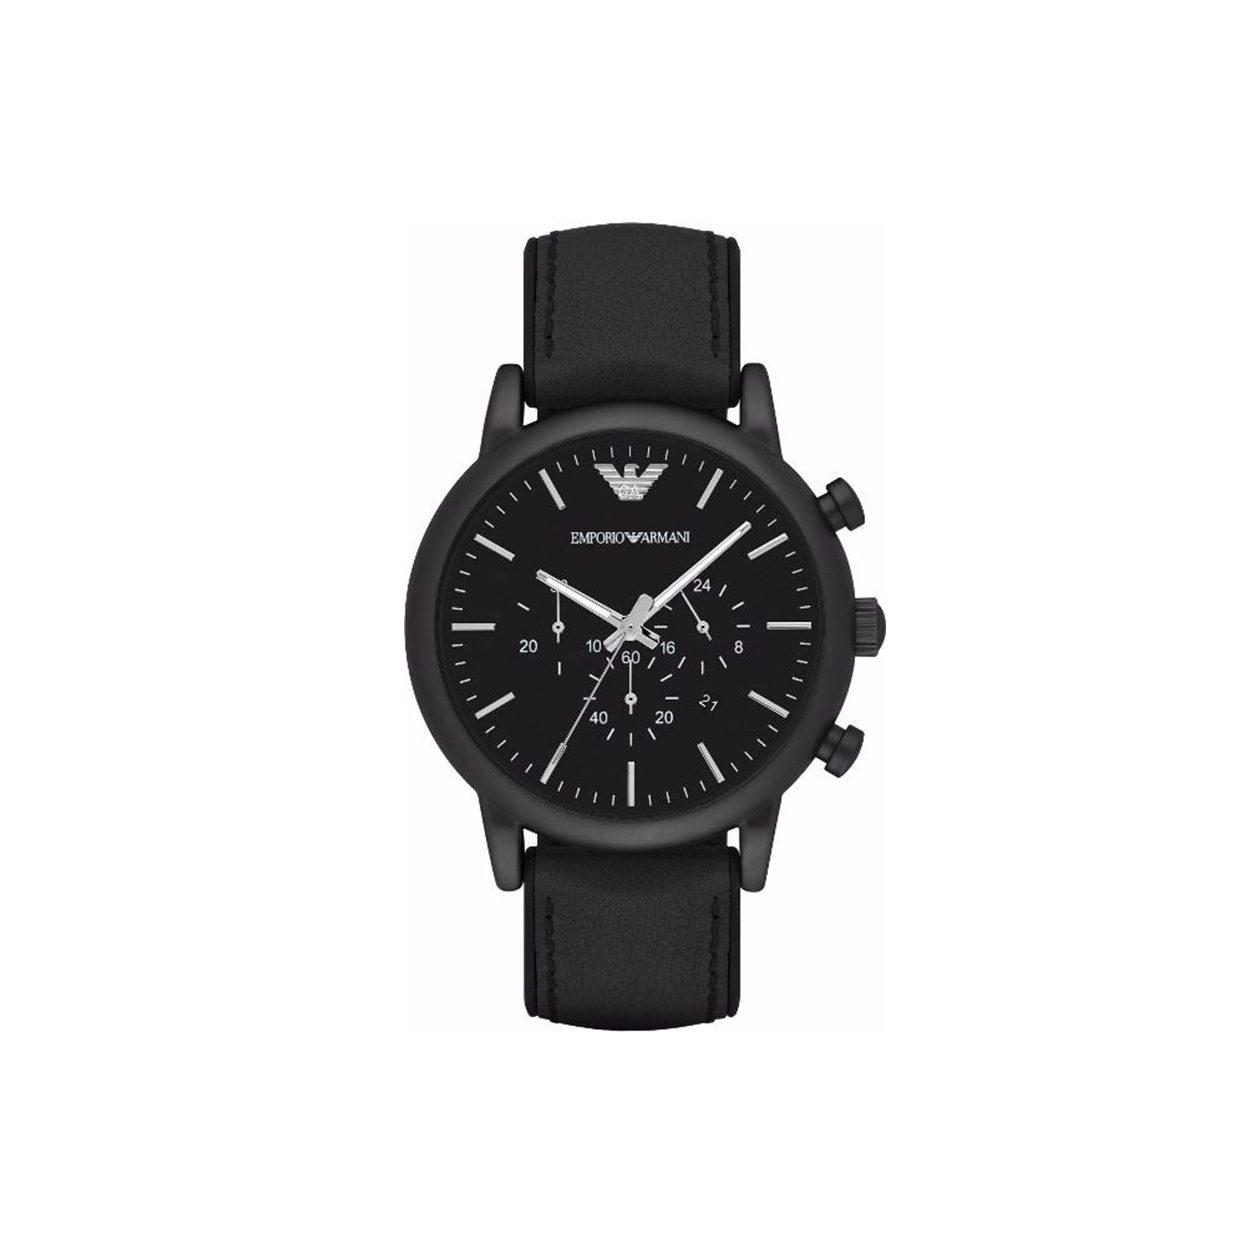 1627b536d1 Emporio Armani Luigi Chronograph Men s Watch – Jewelor